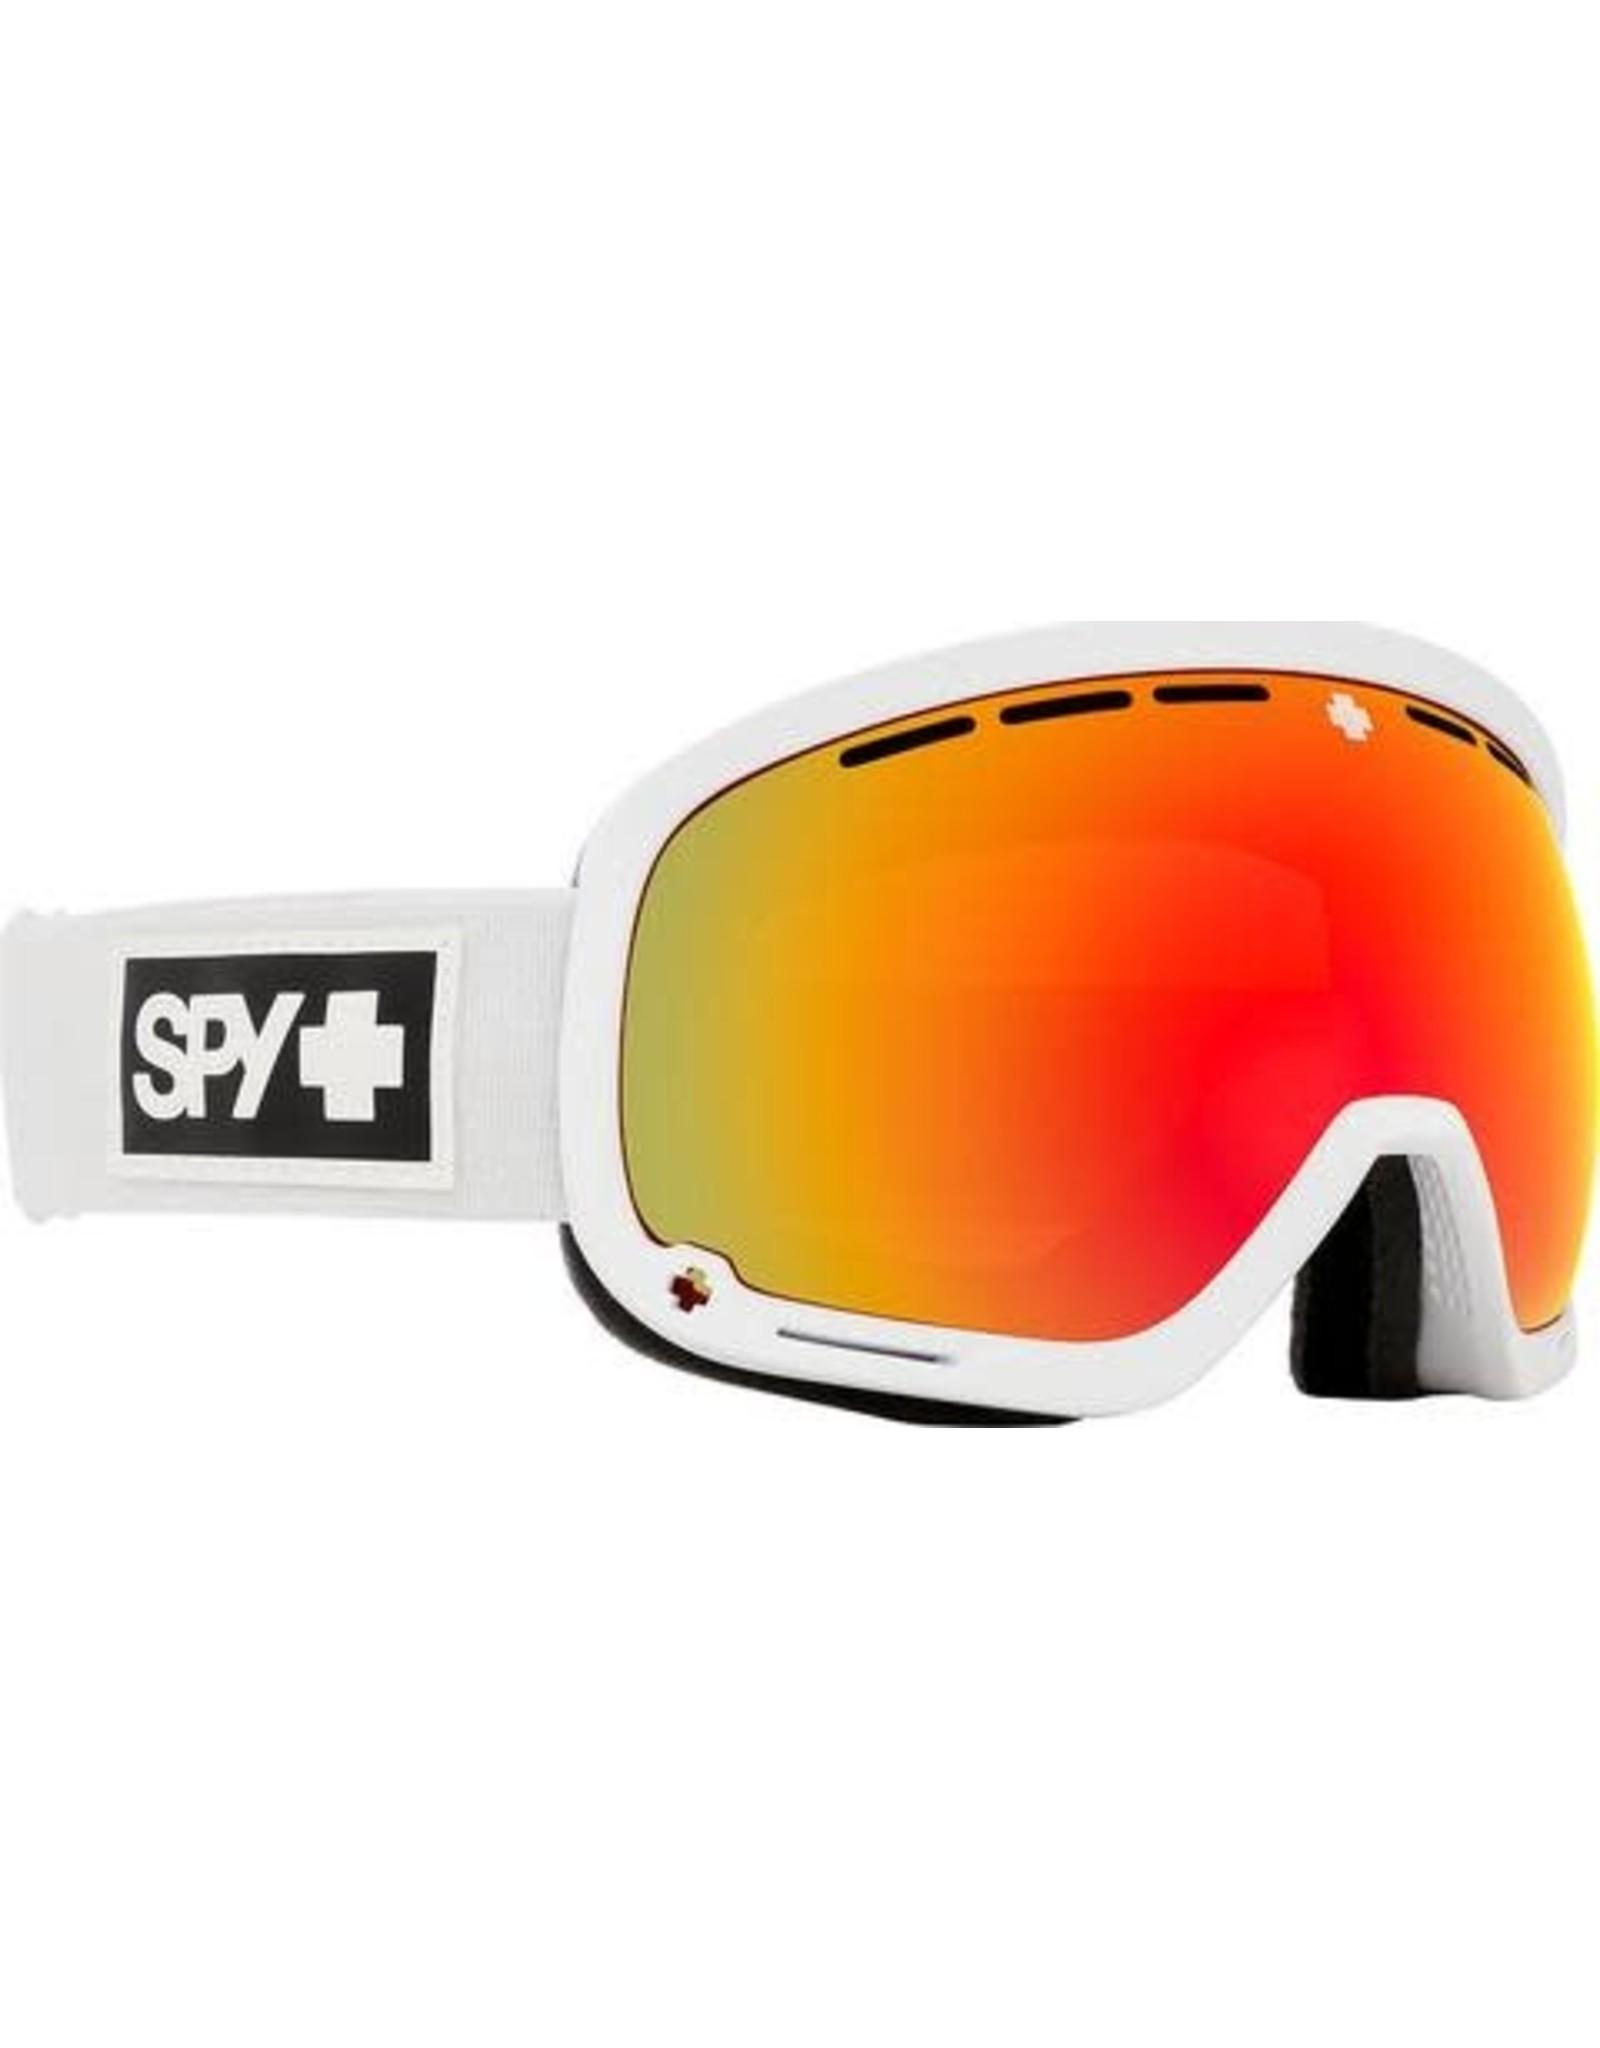 SPY+ Marshall snow Goggle